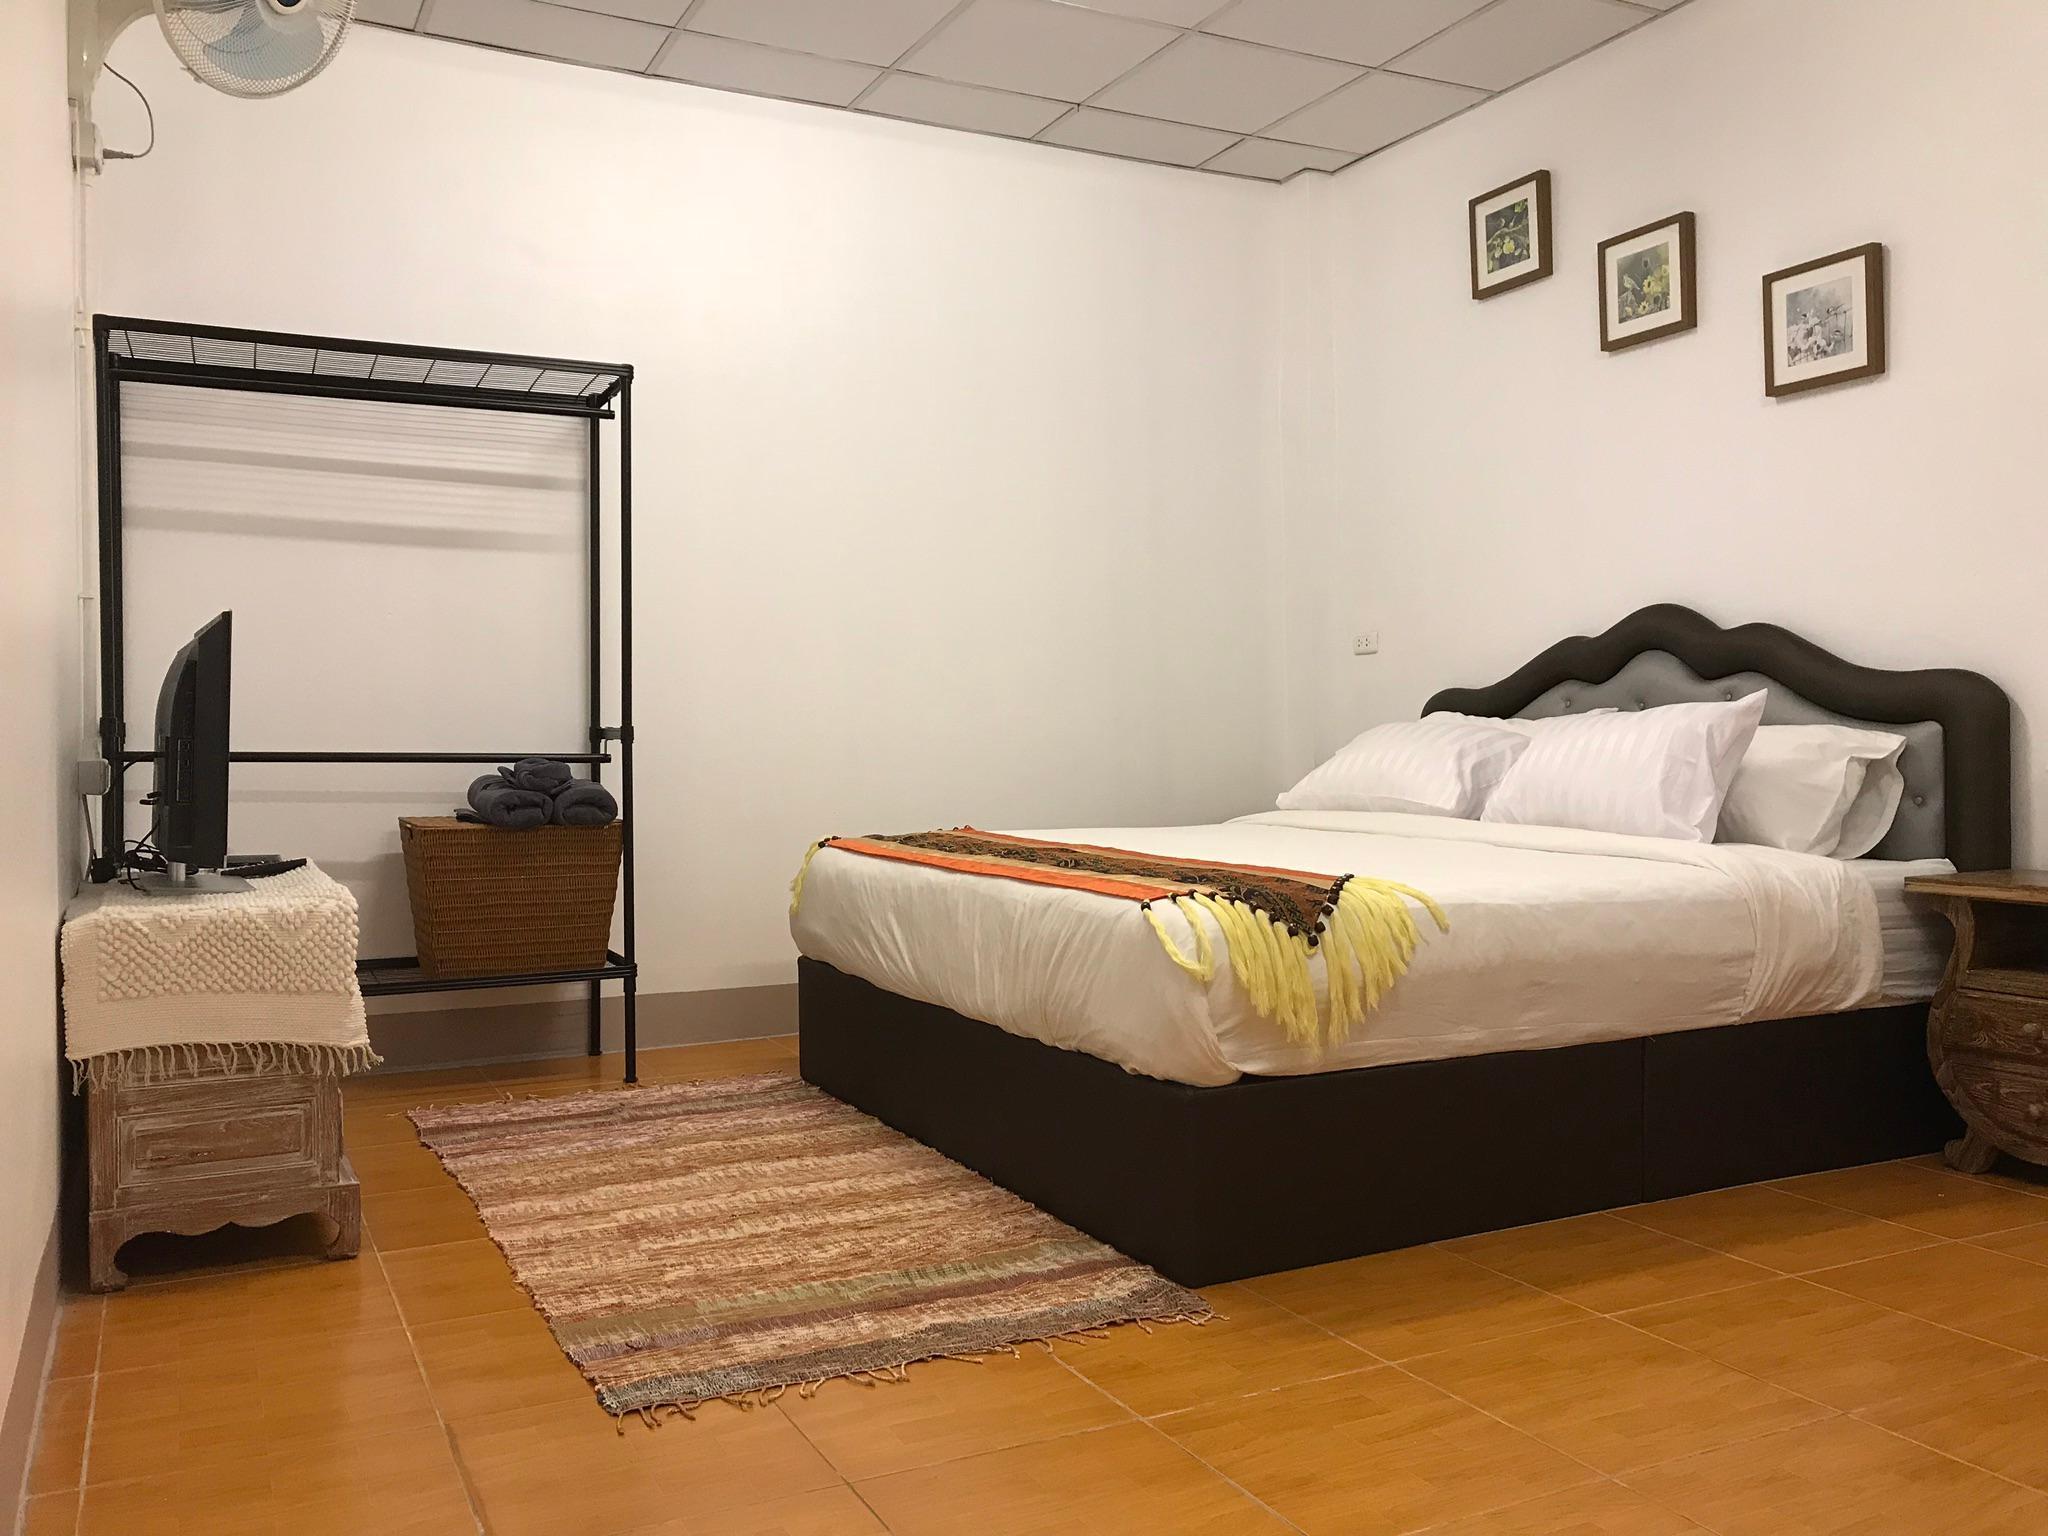 SabaiD House,2 Bedrooms Entire Home,Up to 6 people บ้านเดี่ยว 2 ห้องนอน 1 ห้องน้ำส่วนตัว ขนาด 60 ตร.ม. – สนามบินเชียงใหม่